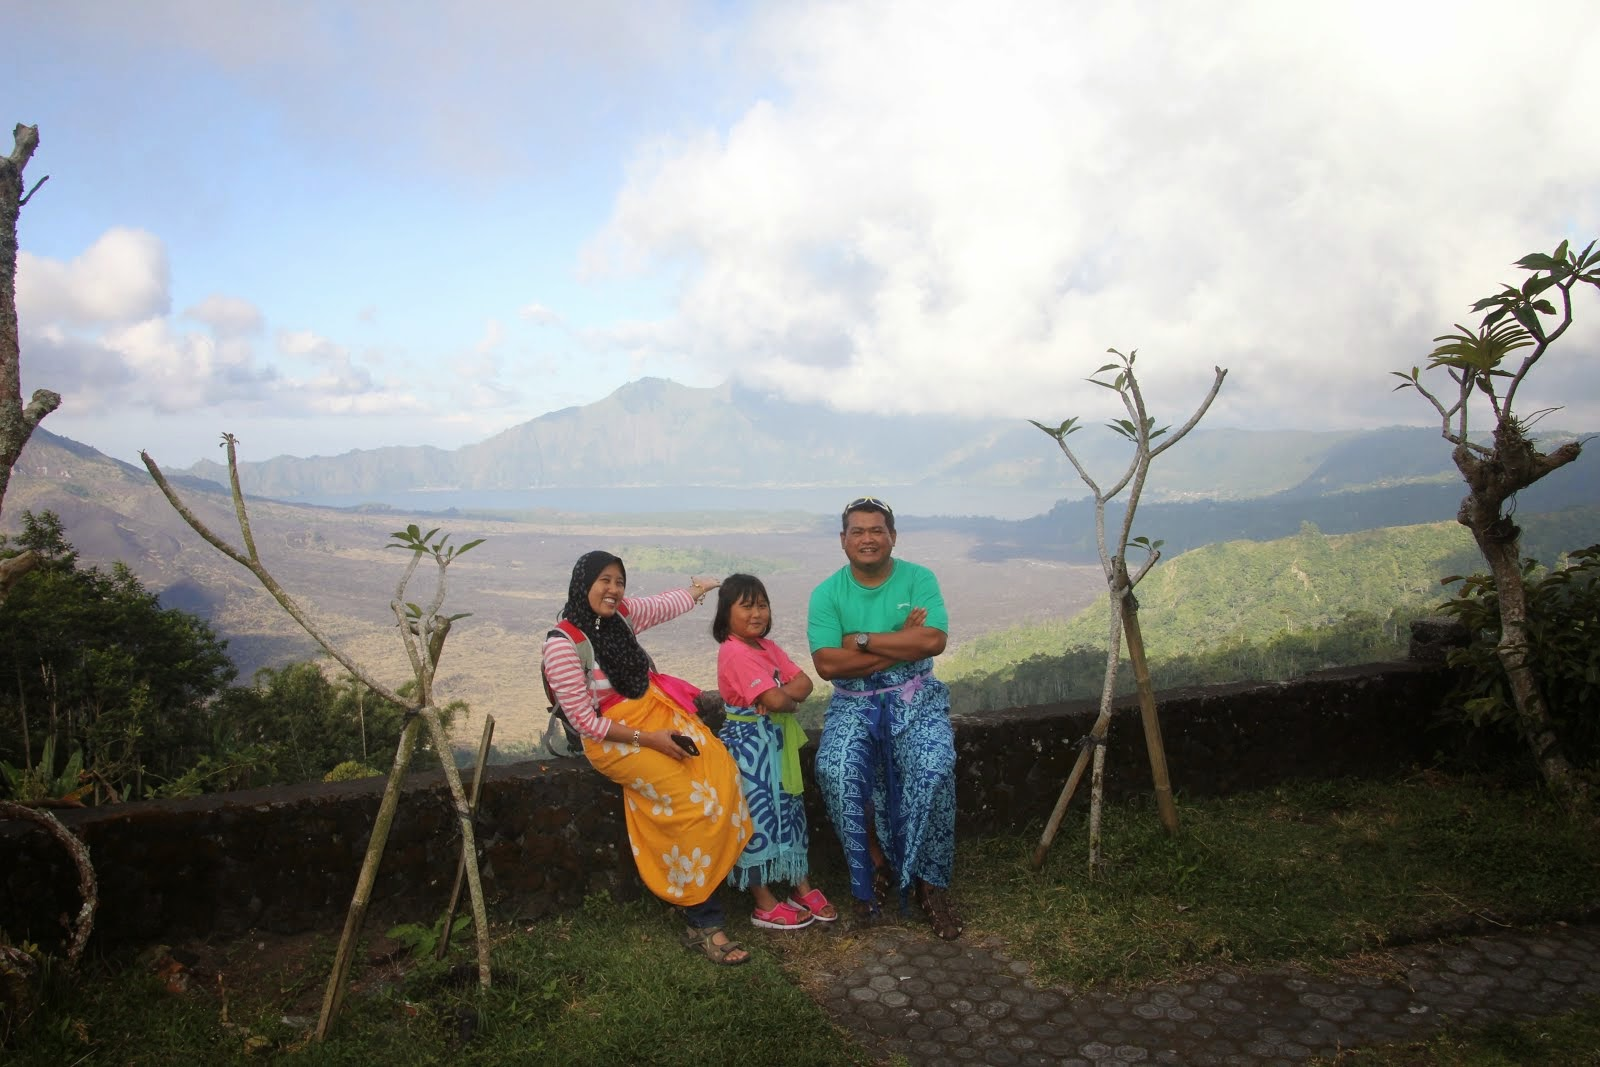 Mount Batur,Bali-May 2014